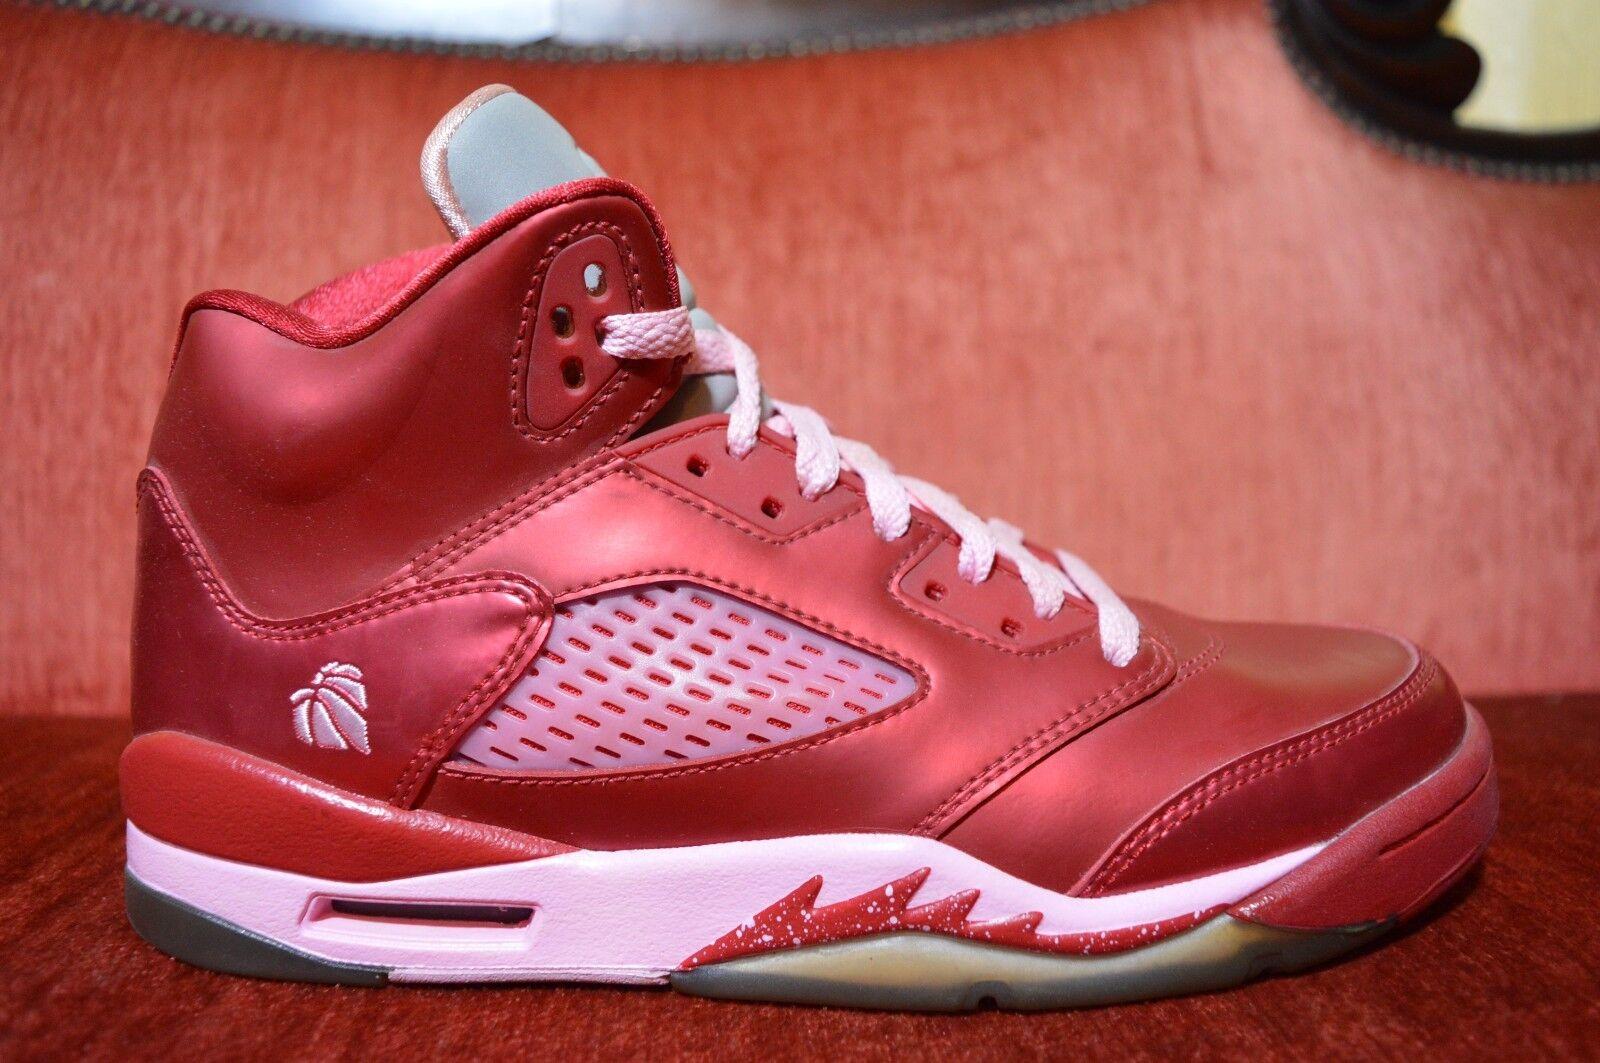 Nike air jordan 5 / retro rosso san valentino numero 7 440892 605 rosa bianca